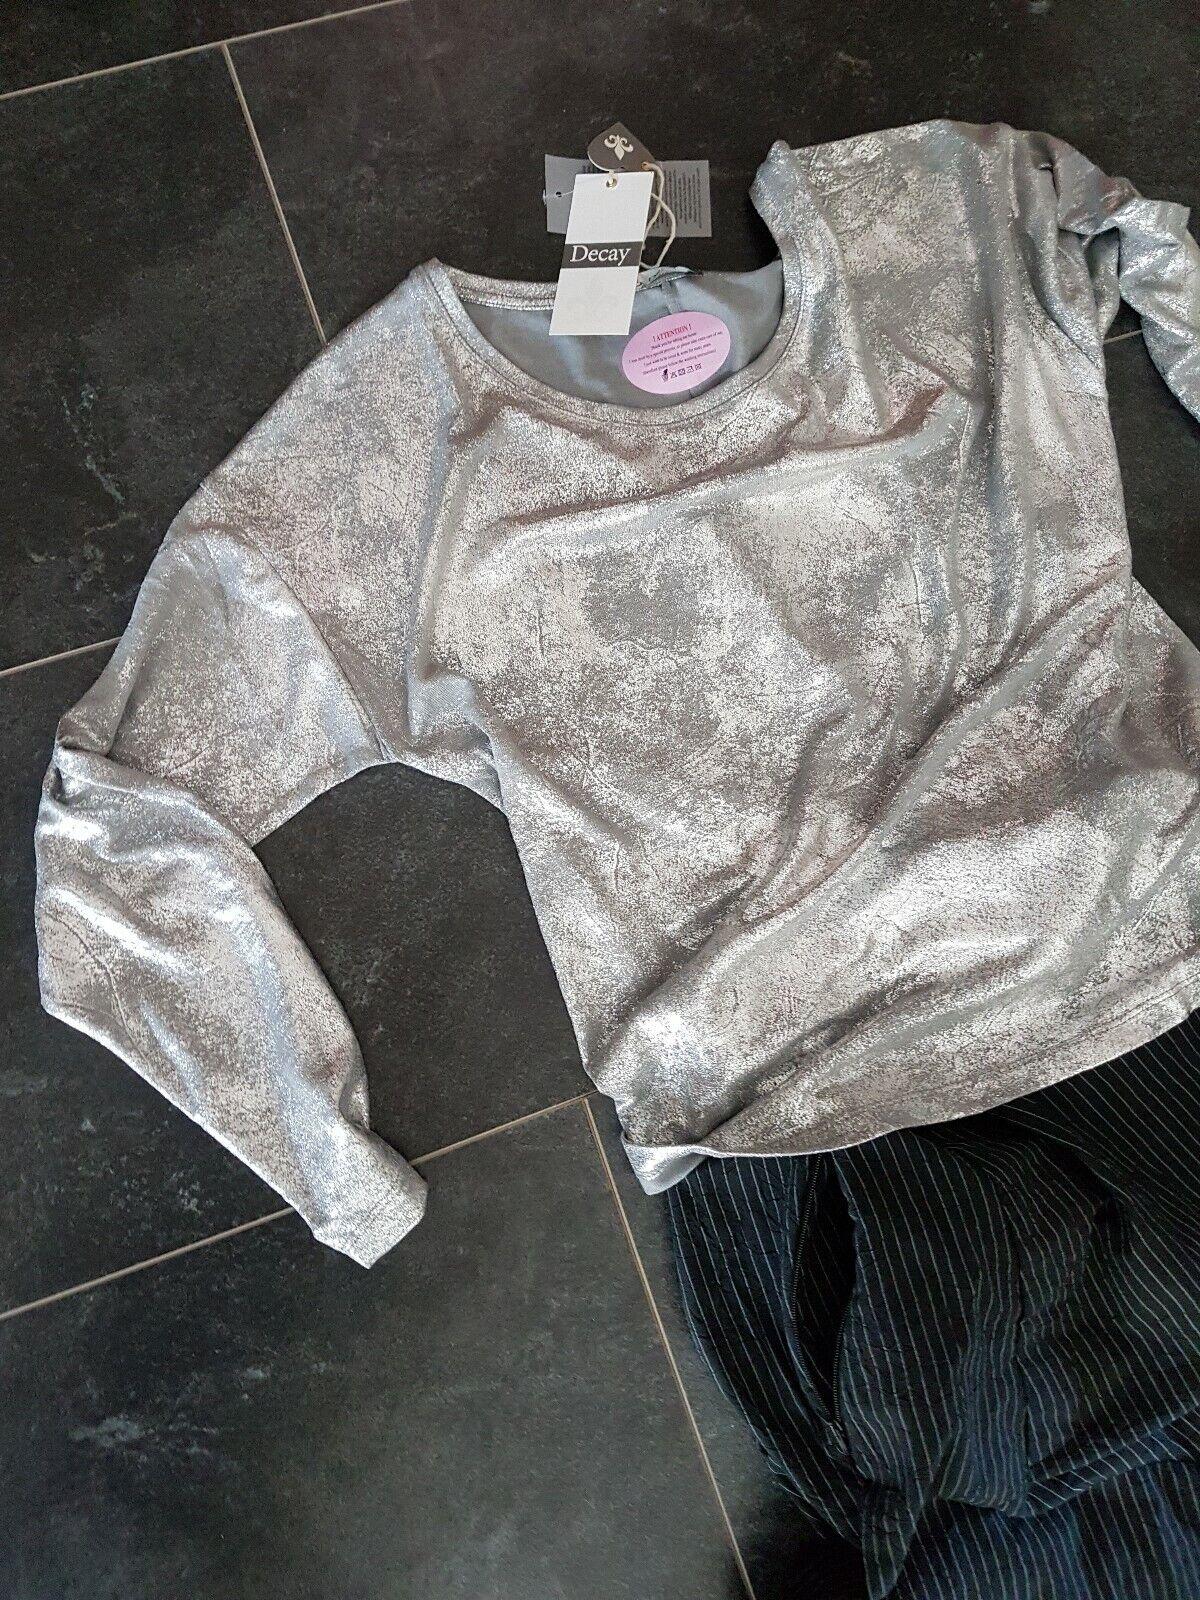 DECAY   Sweater   Pulli   Shirt   GRAU SILBER        TRAUMTEIL   Gr.XL